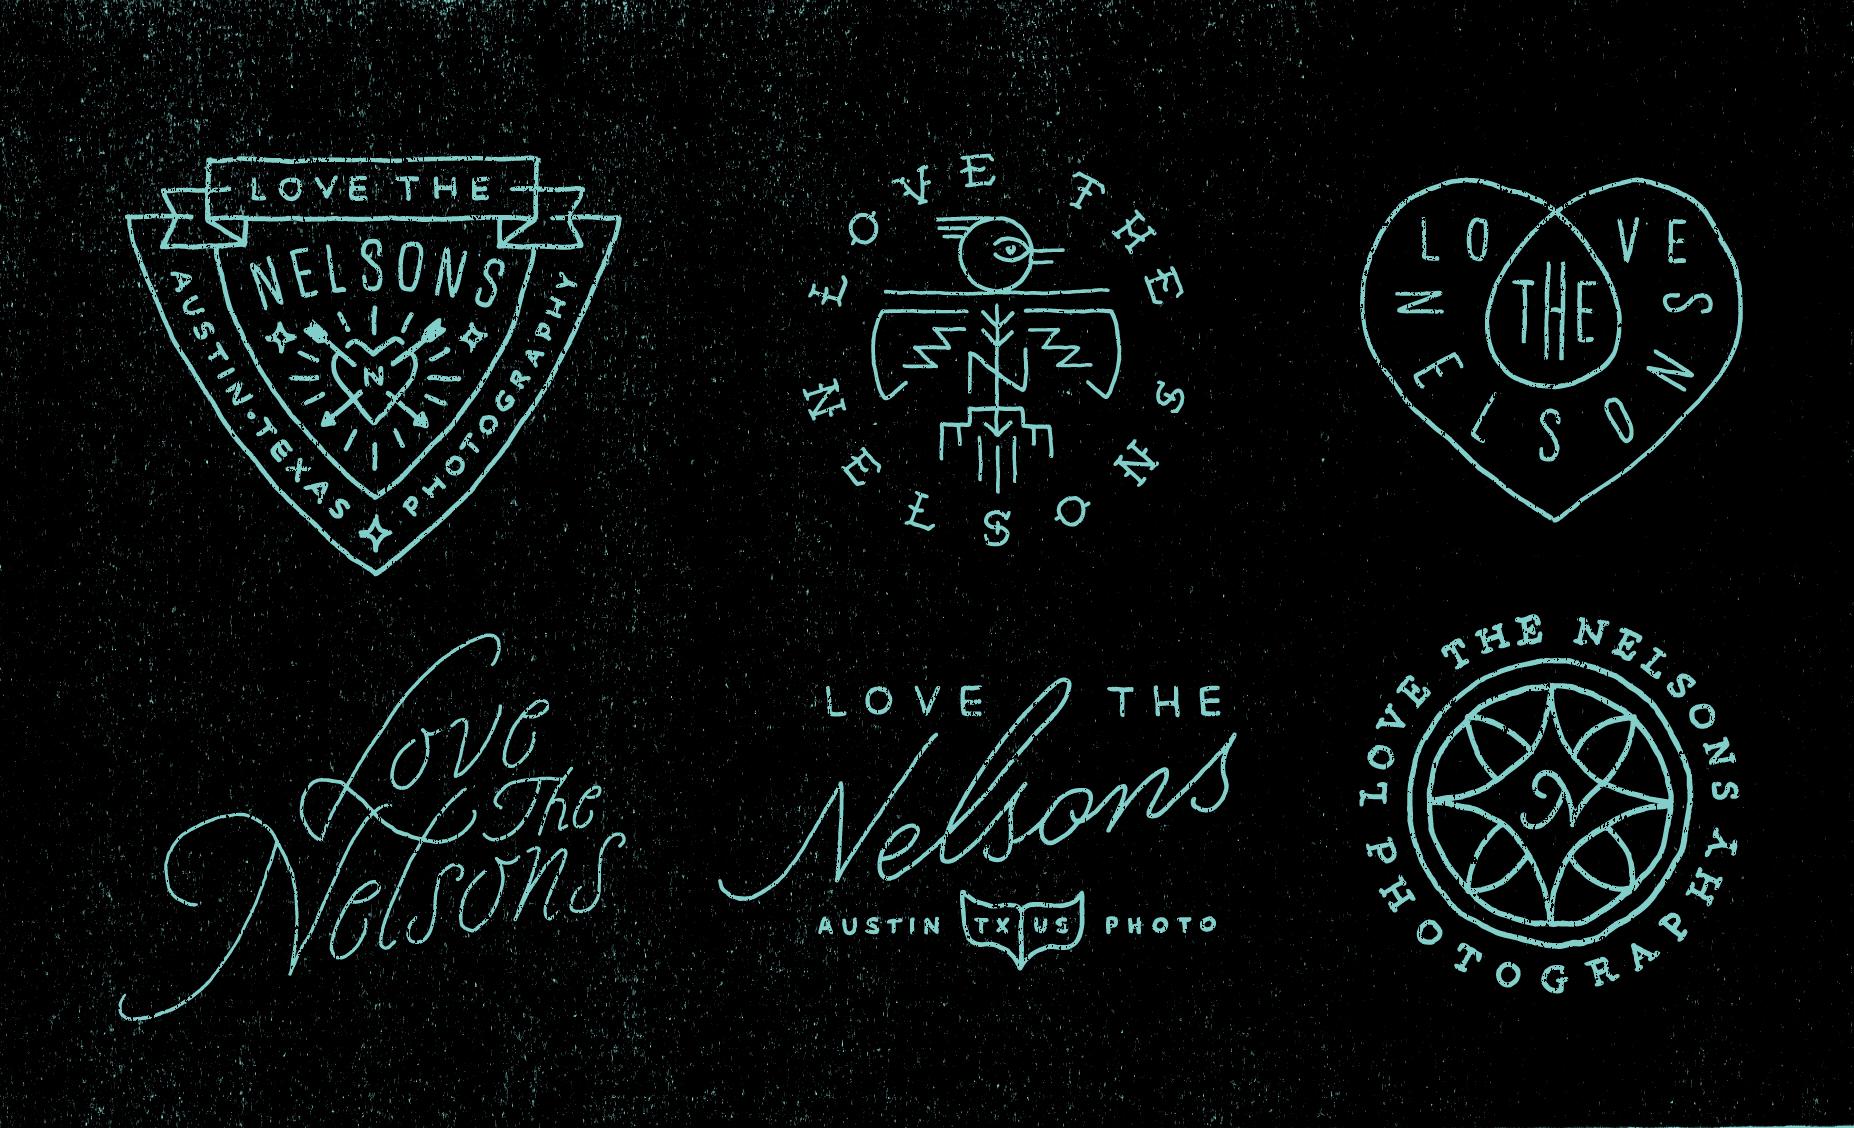 Lovethenelsons